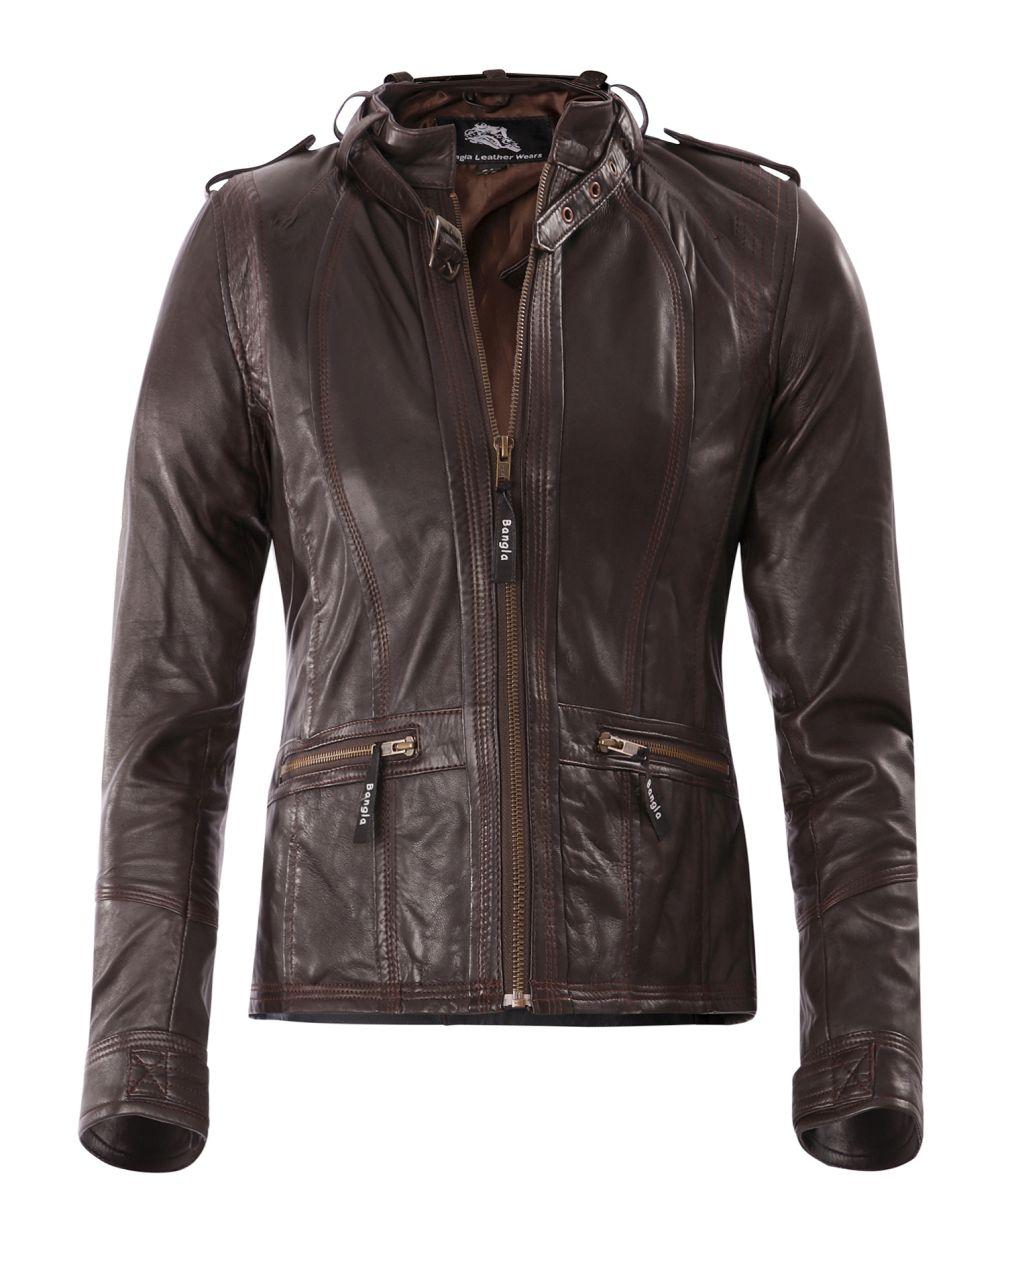 Damen Lederjacke Jacke mit Stehkragen Bangla 14395 Braun  36 38 40 42 44